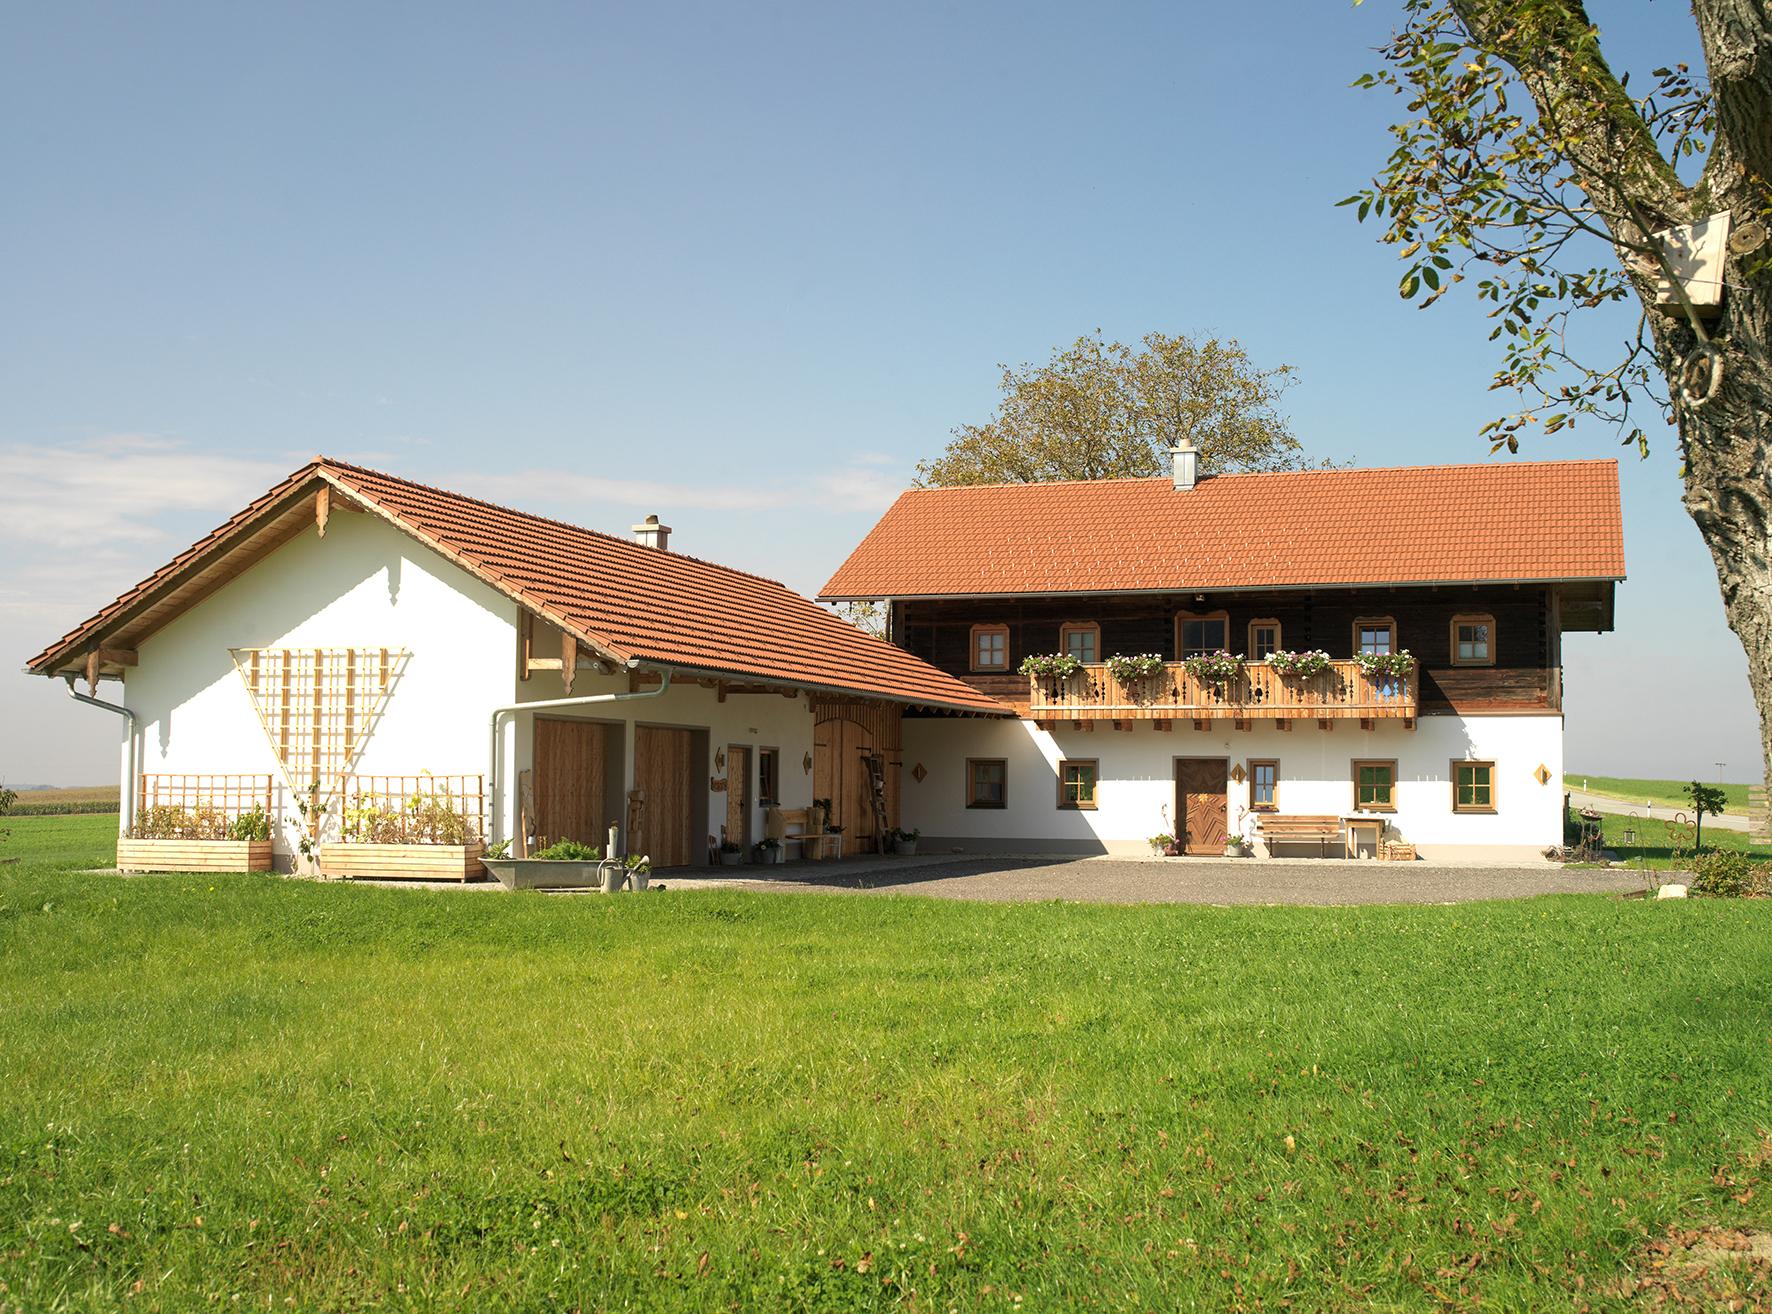 Holz-Dachaufstockung